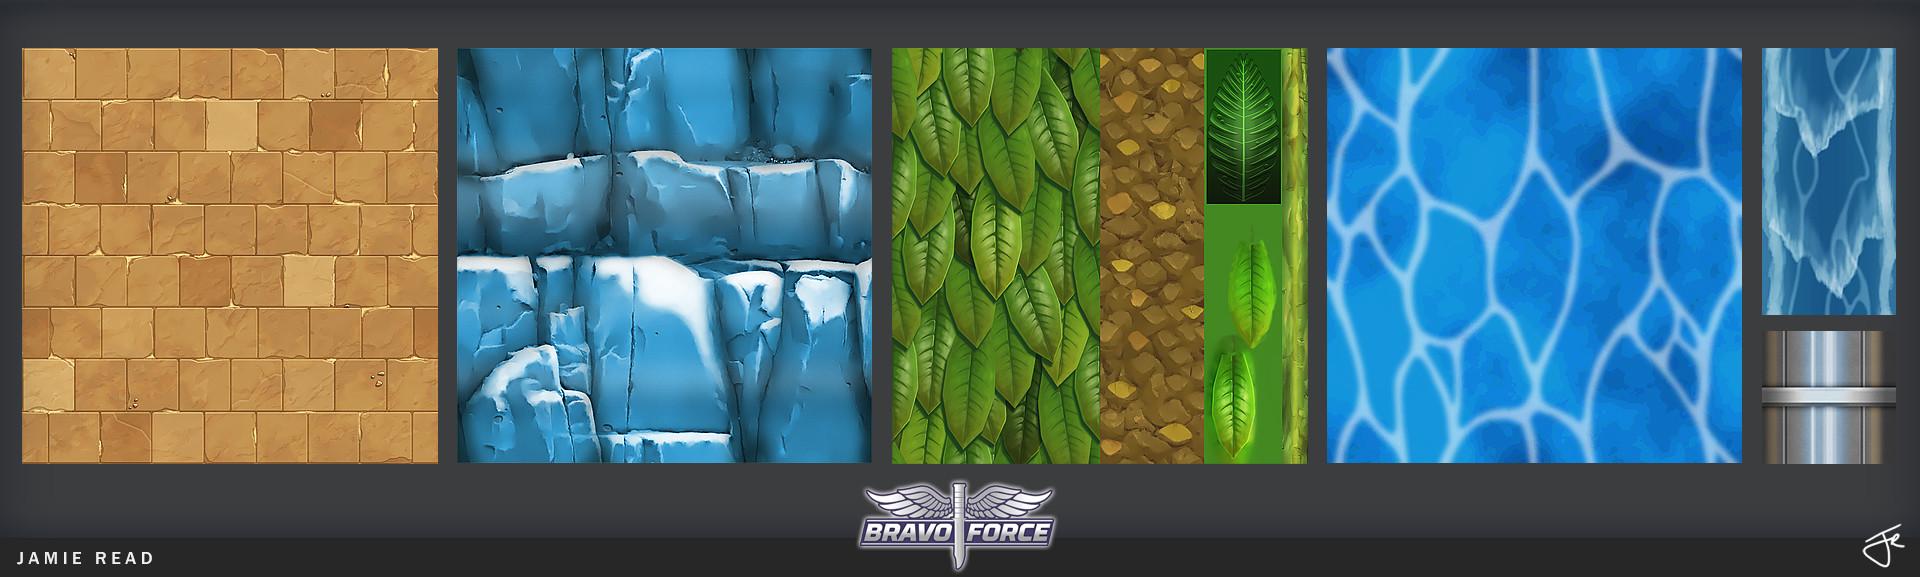 Jamie rex portfolio bravoforce arena textures 01